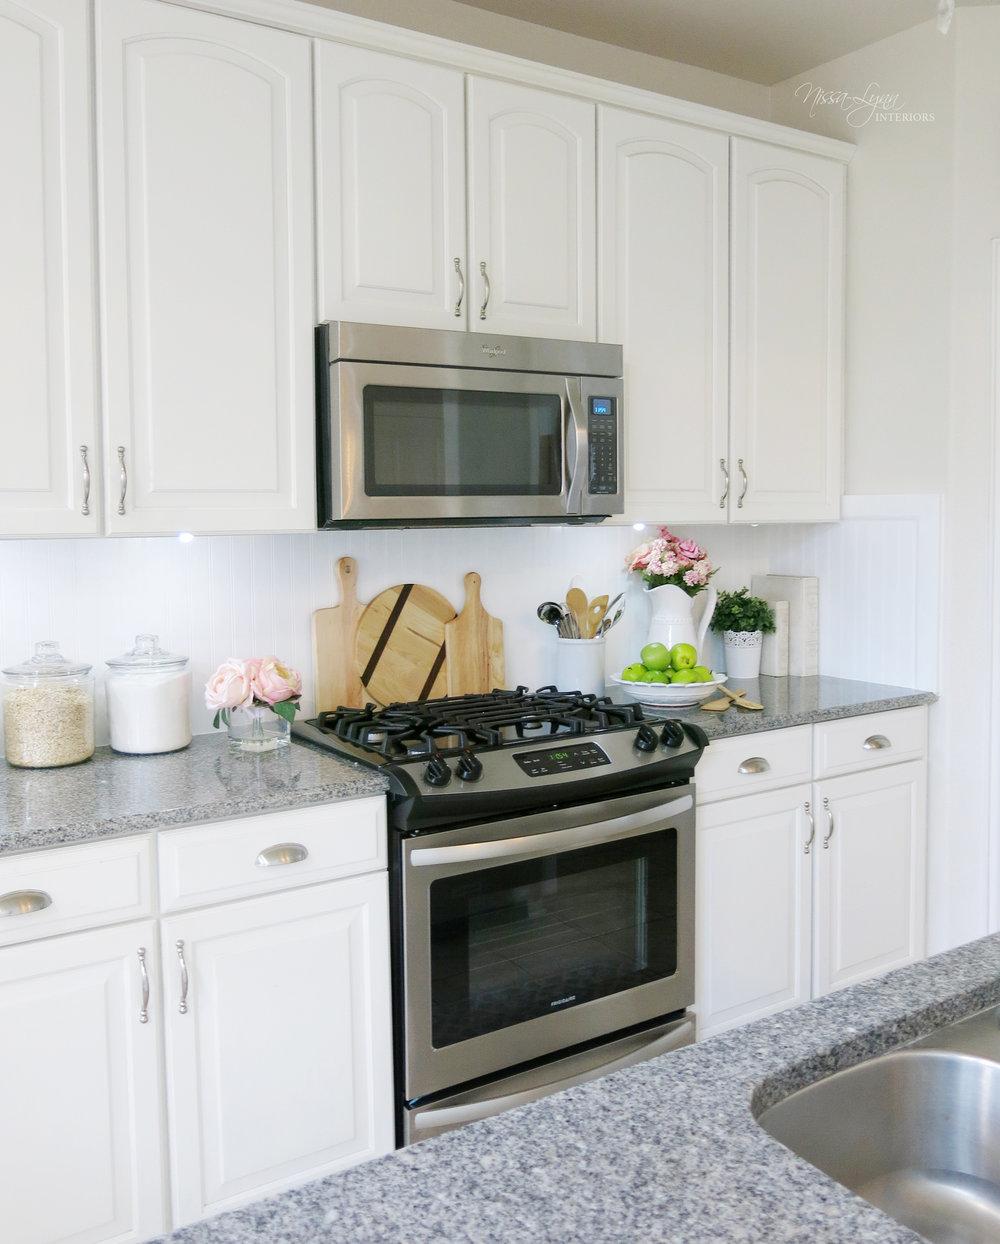 Appliance Shopping Stress Free with Neska Furniture Mart — Nissa on